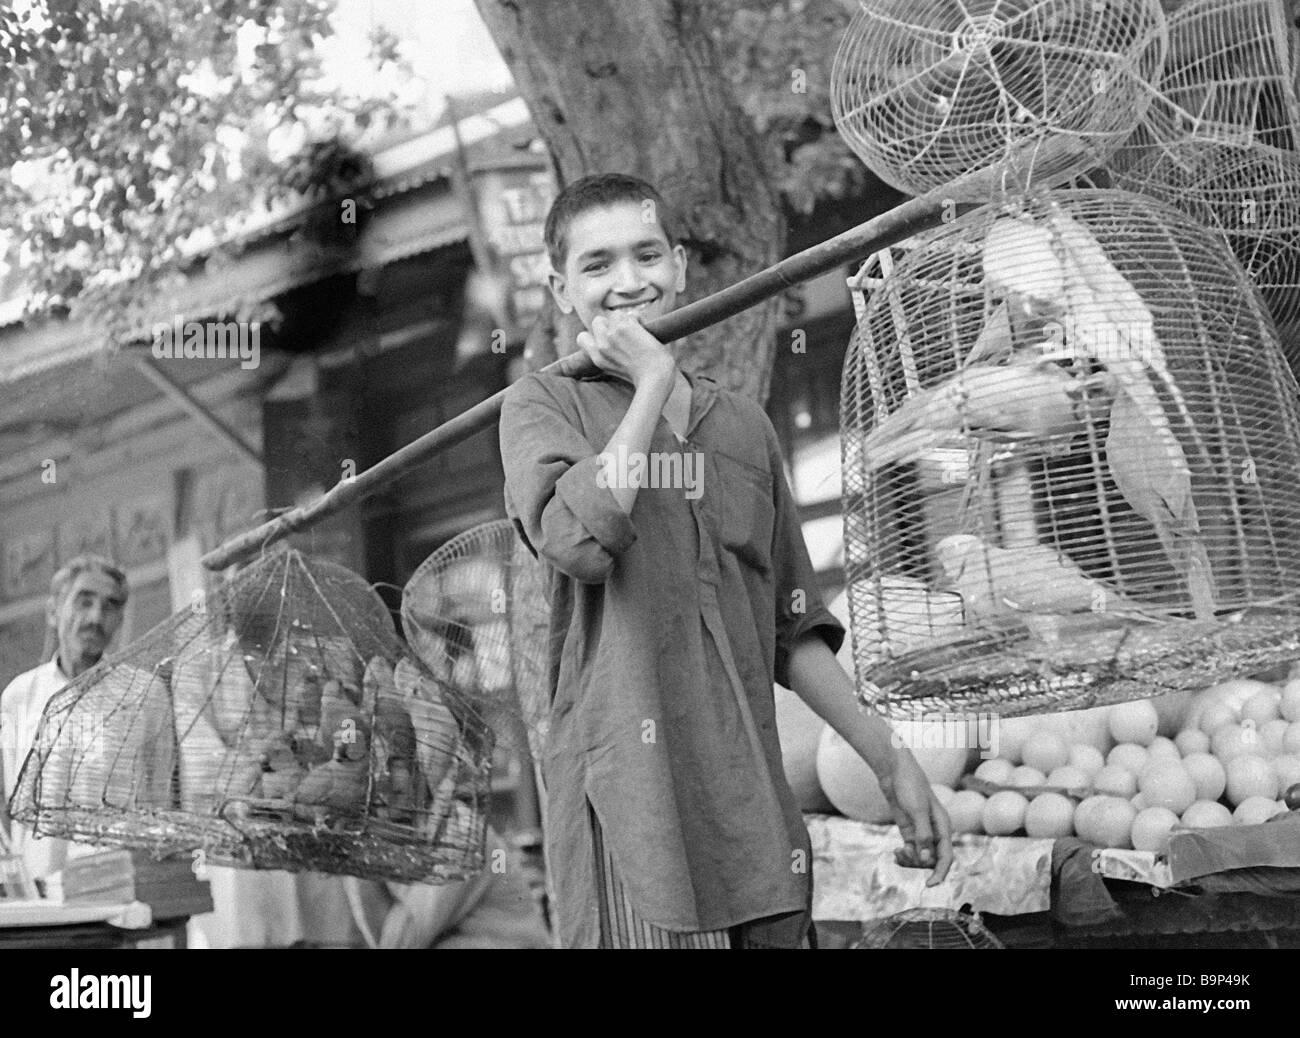 A bird seller in a peshawar market place stock image